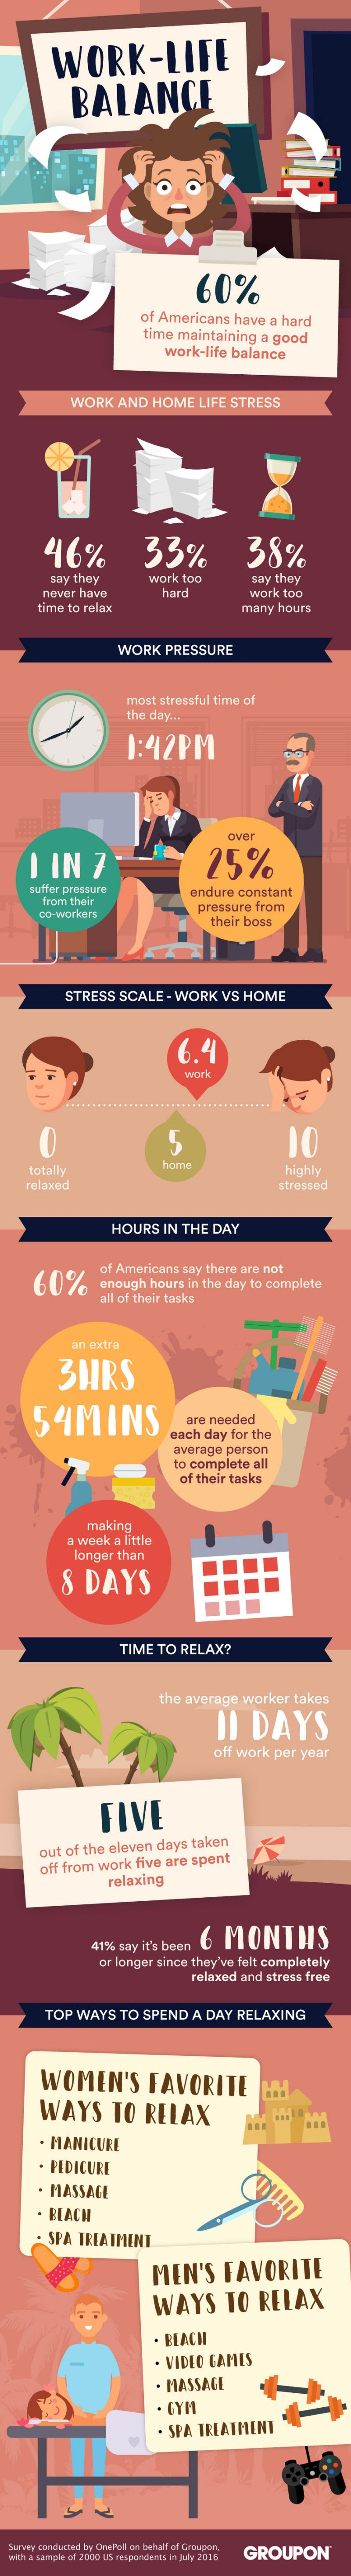 digital-marketing-infographics-15-work-life-balance.jpg